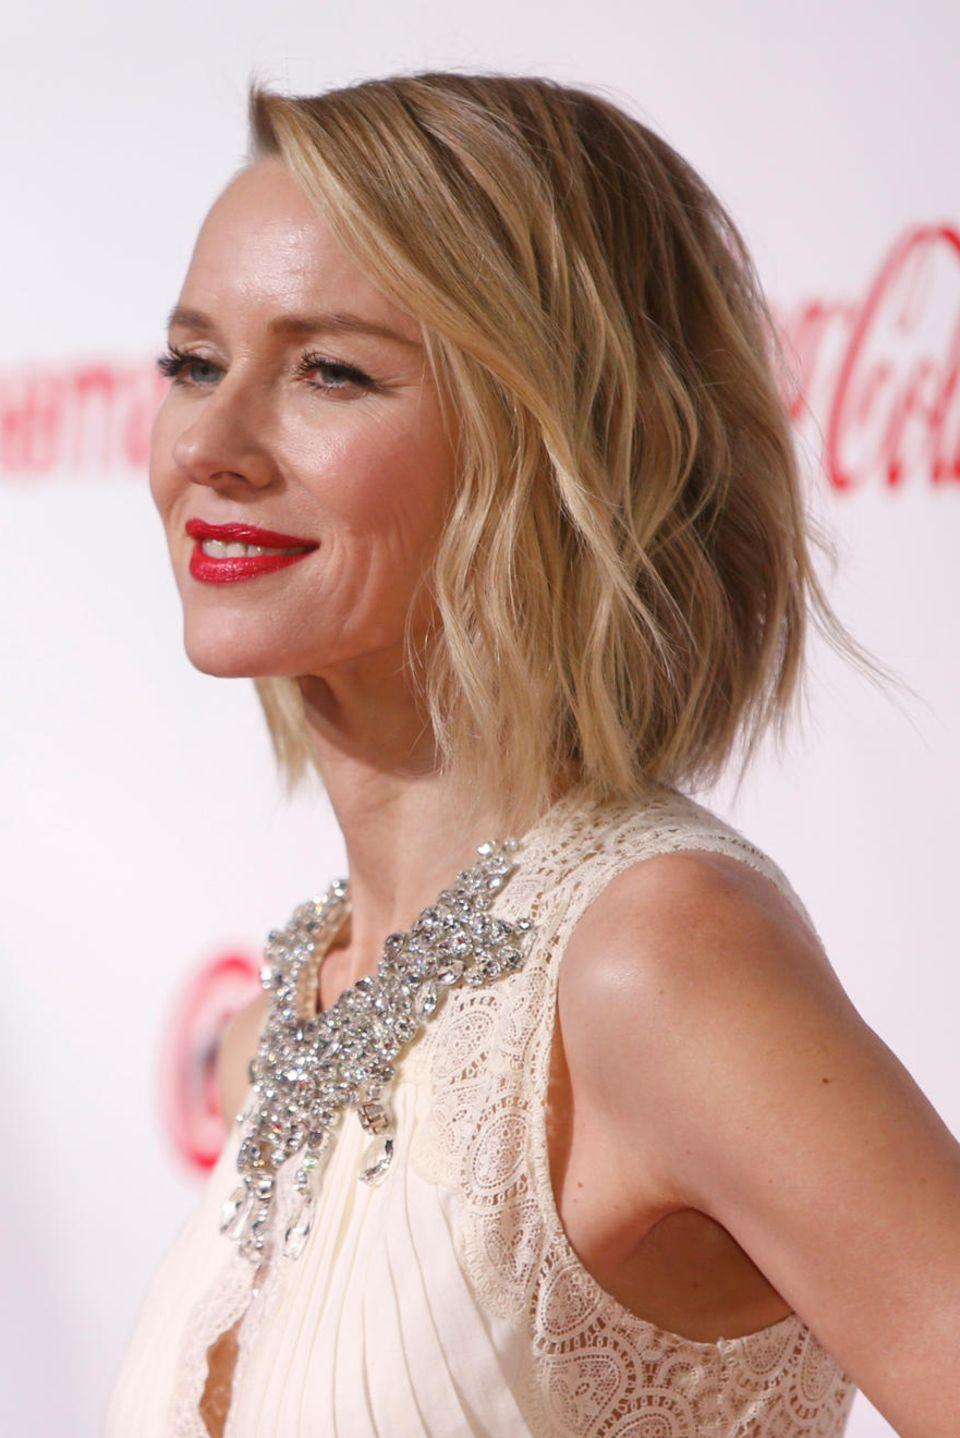 Ist Naomi Watts neu verliebt?